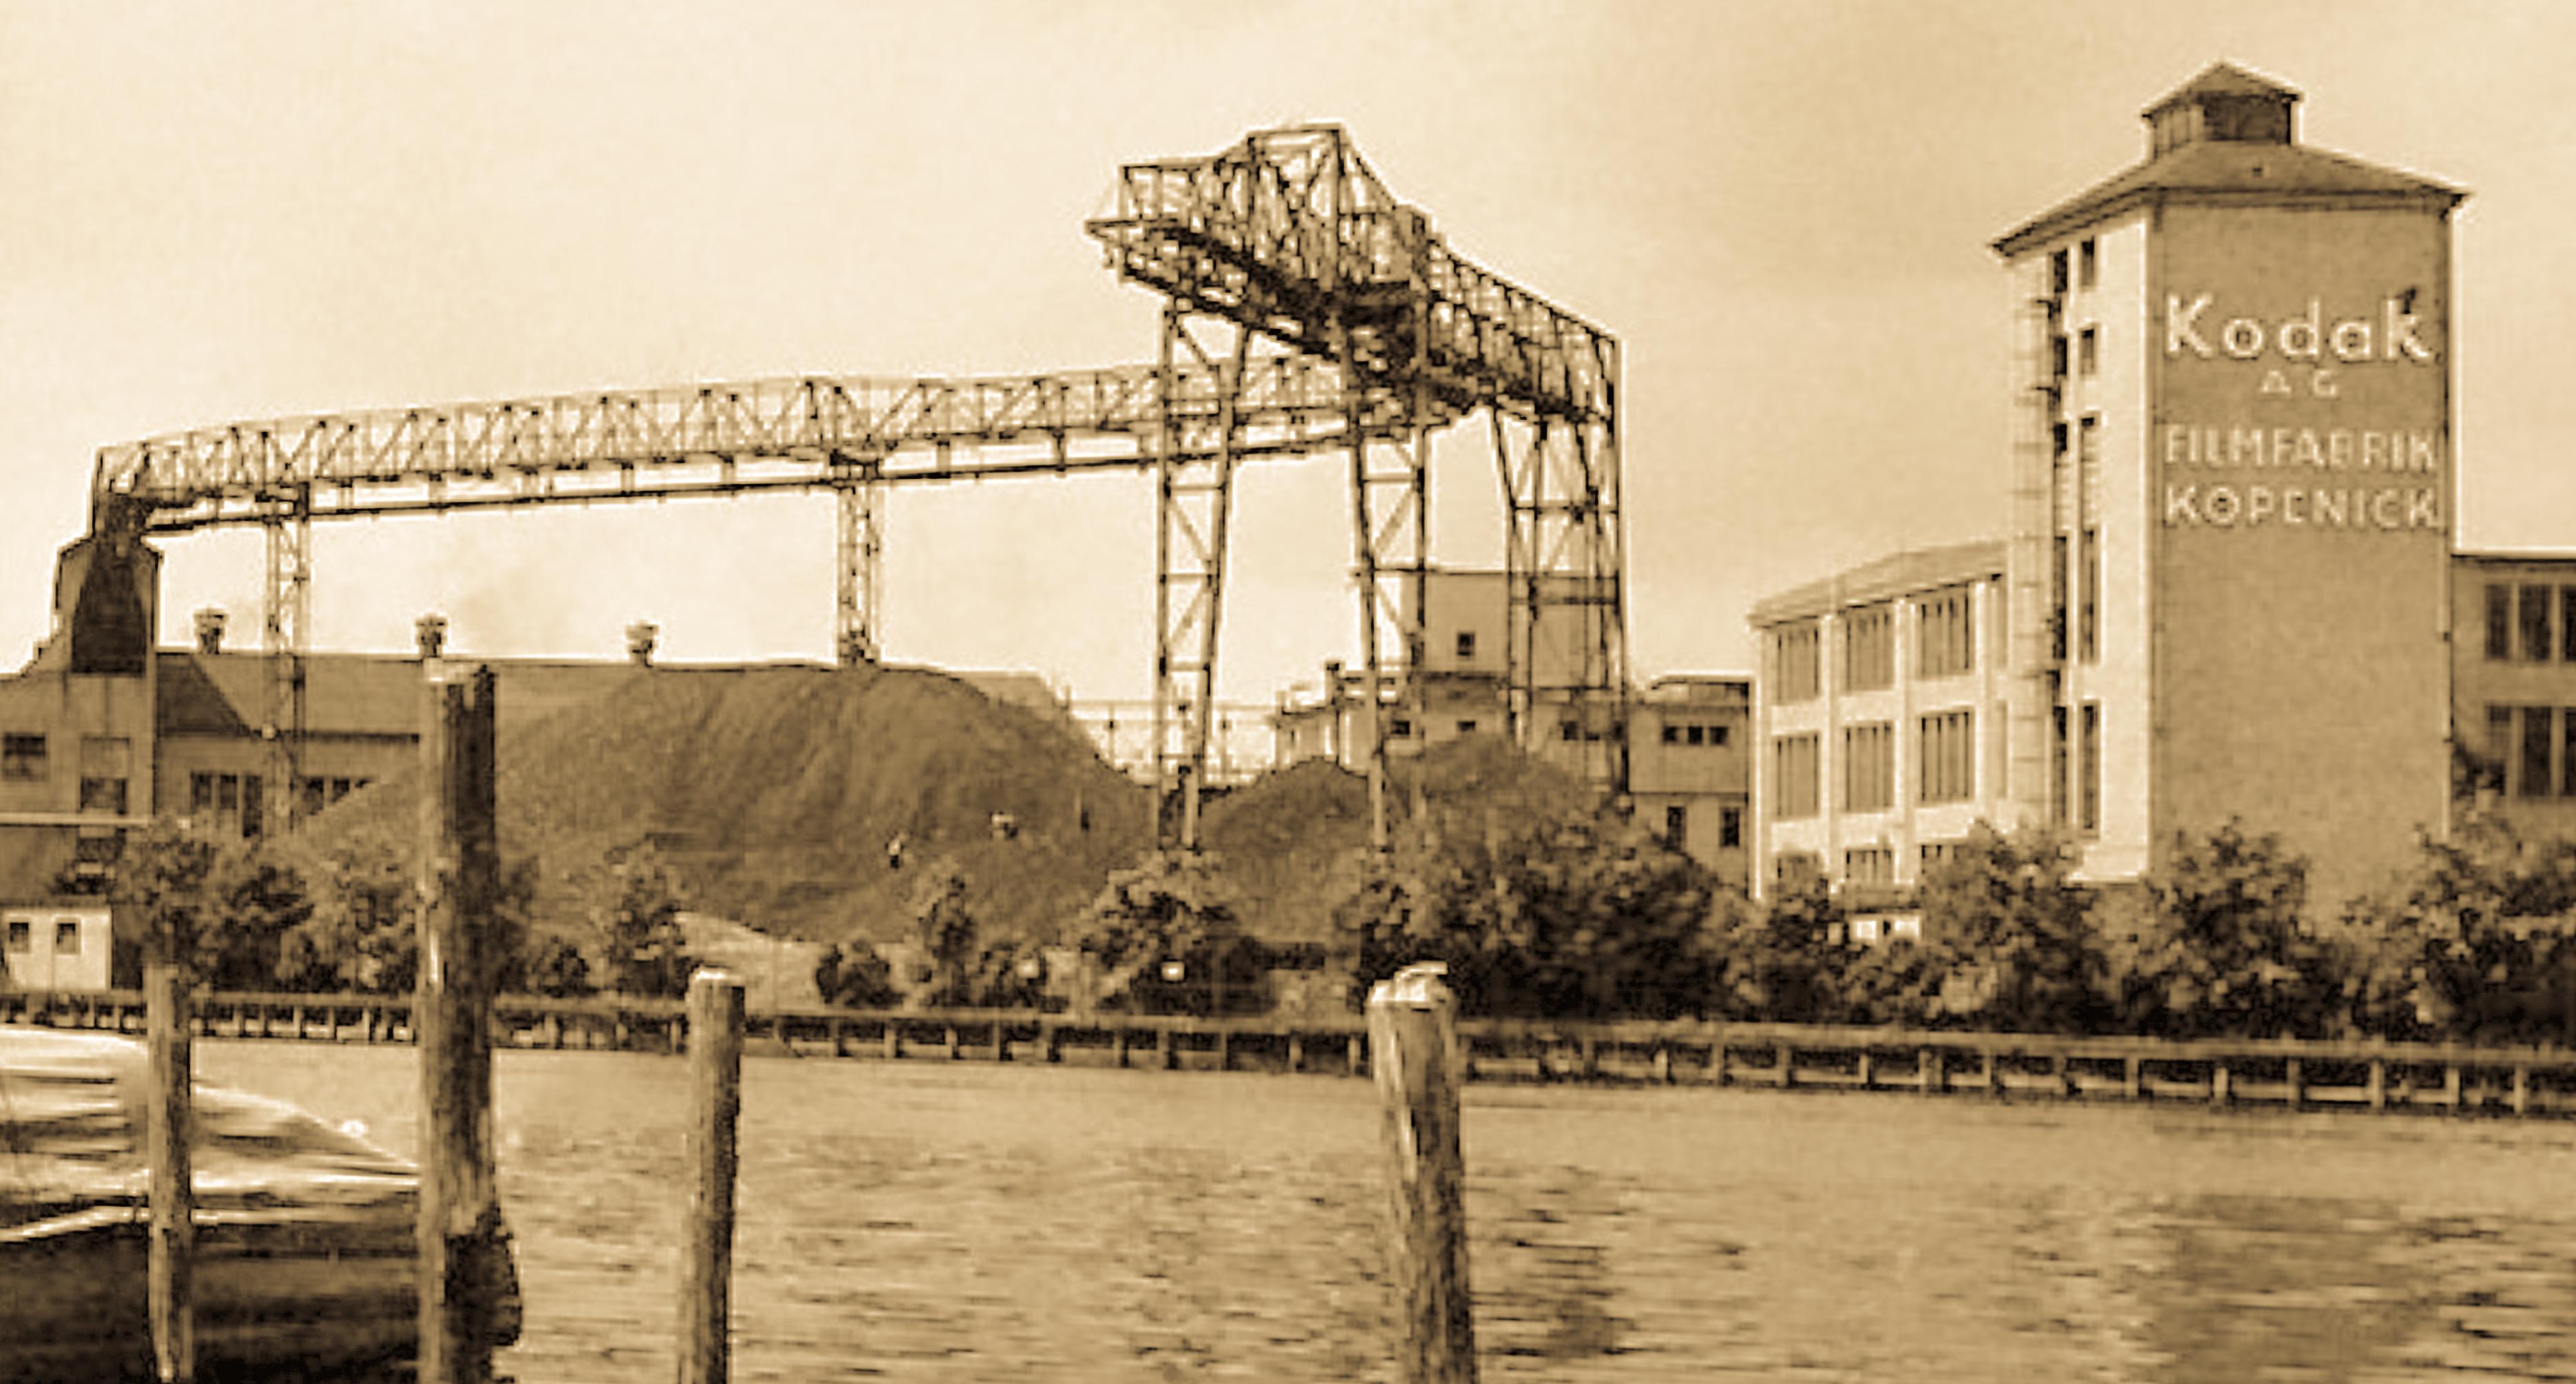 Kodak factory on River Spree (Pic: Unknown)